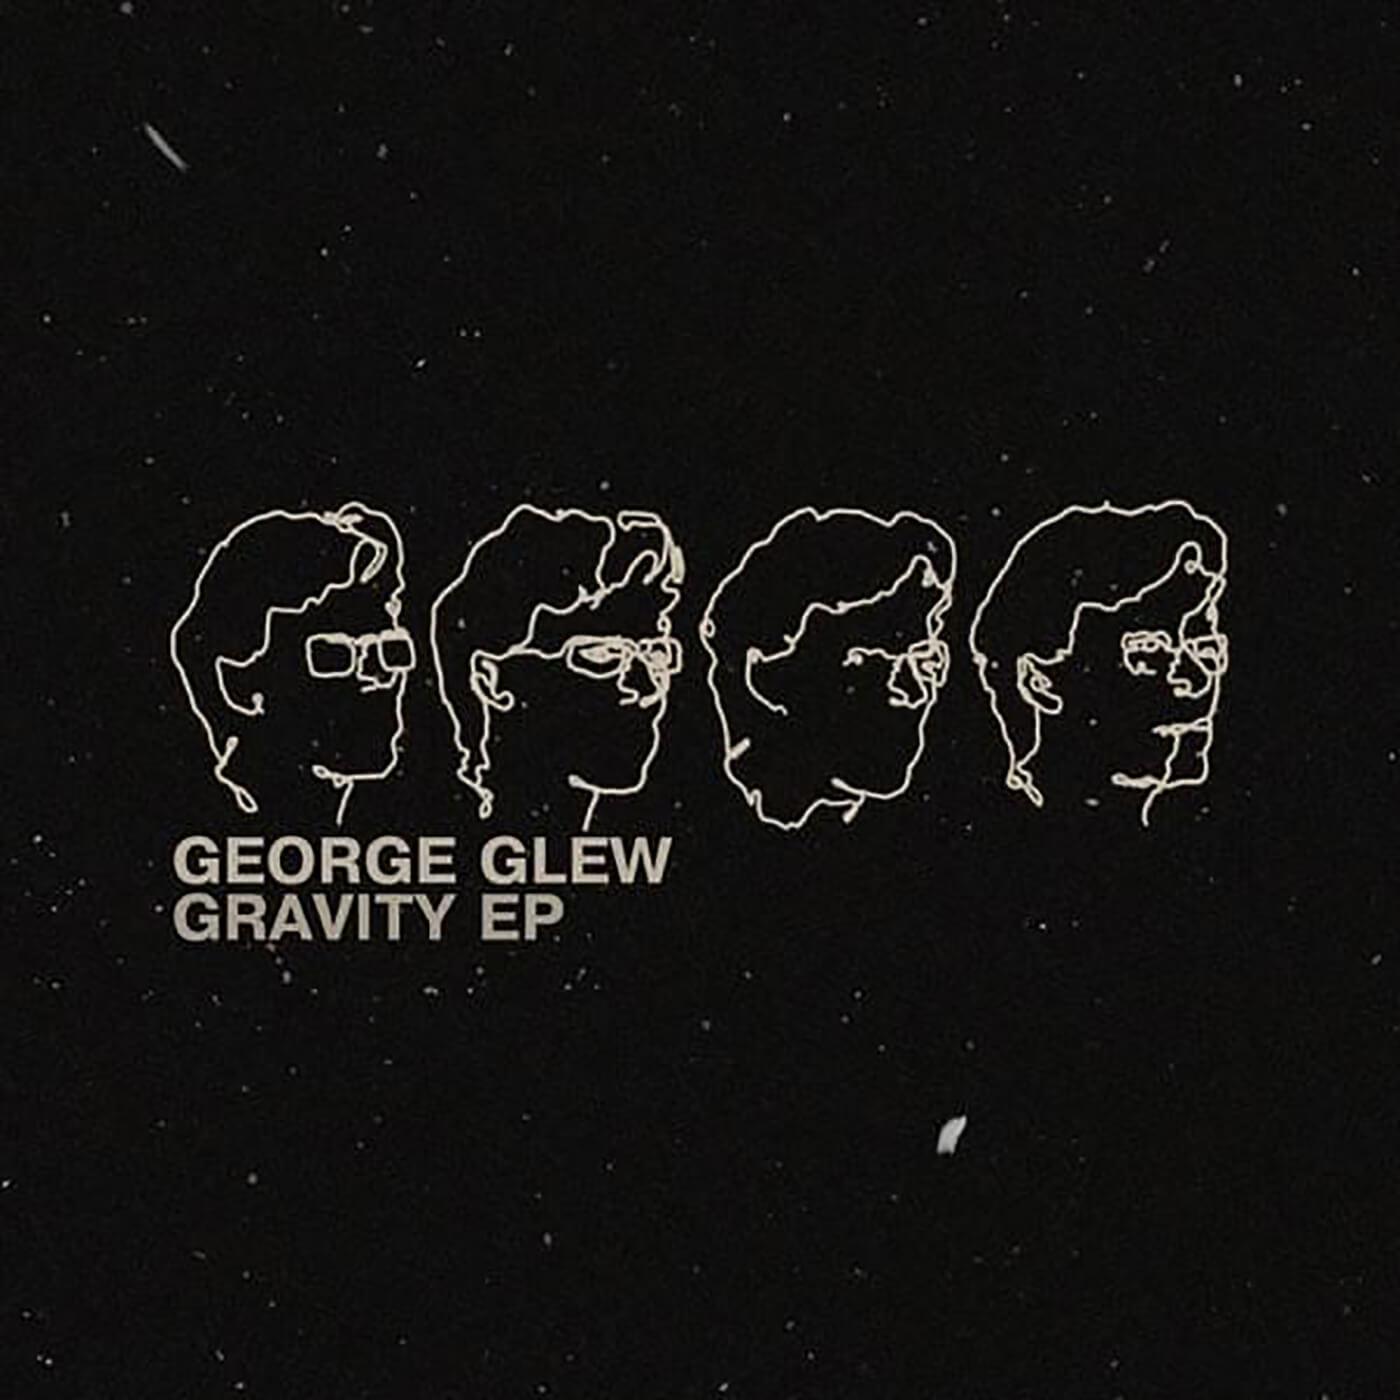 George Glew - Gravity